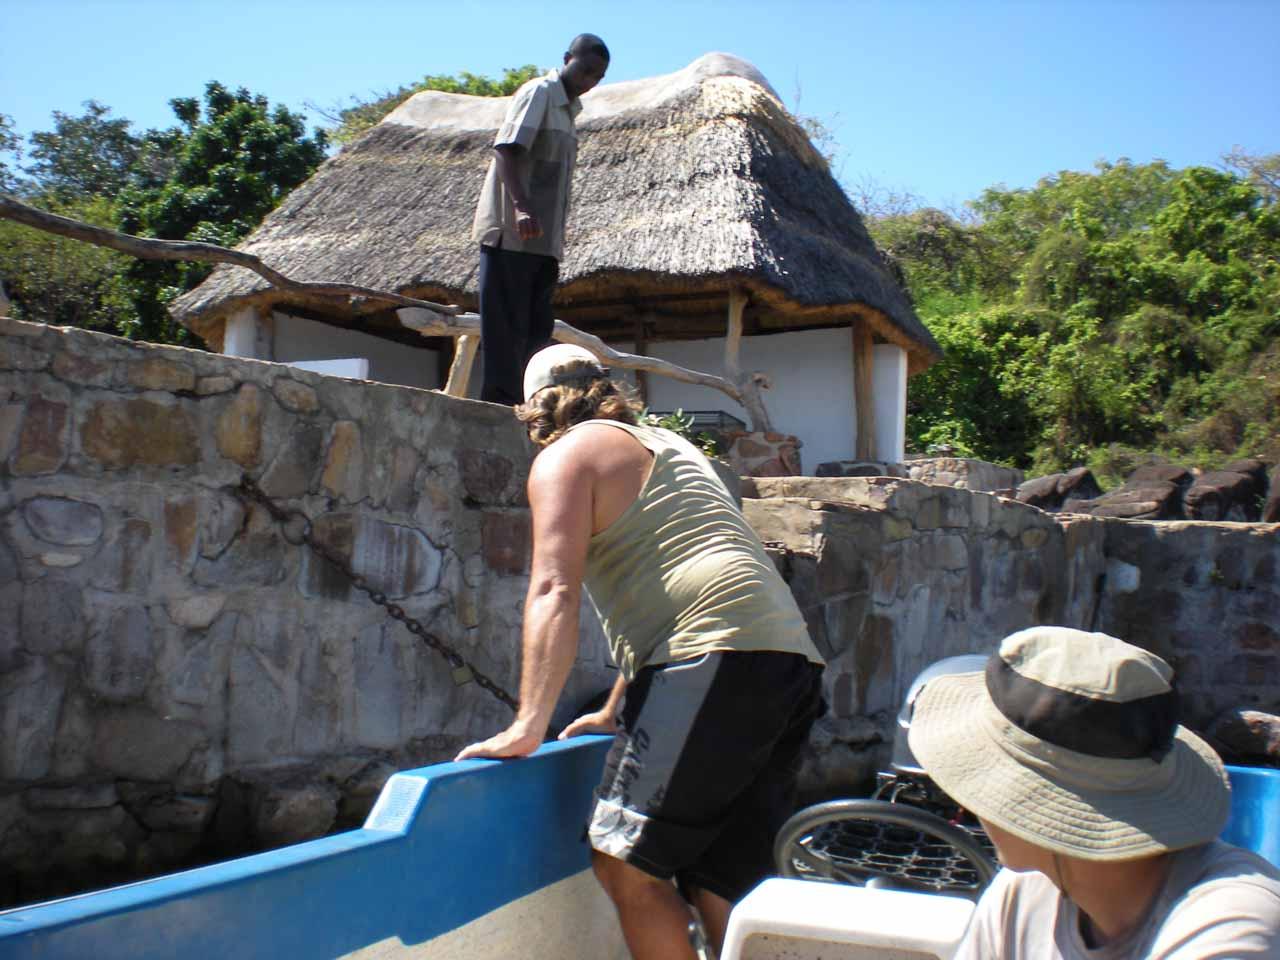 Arriving at Isanga Bay